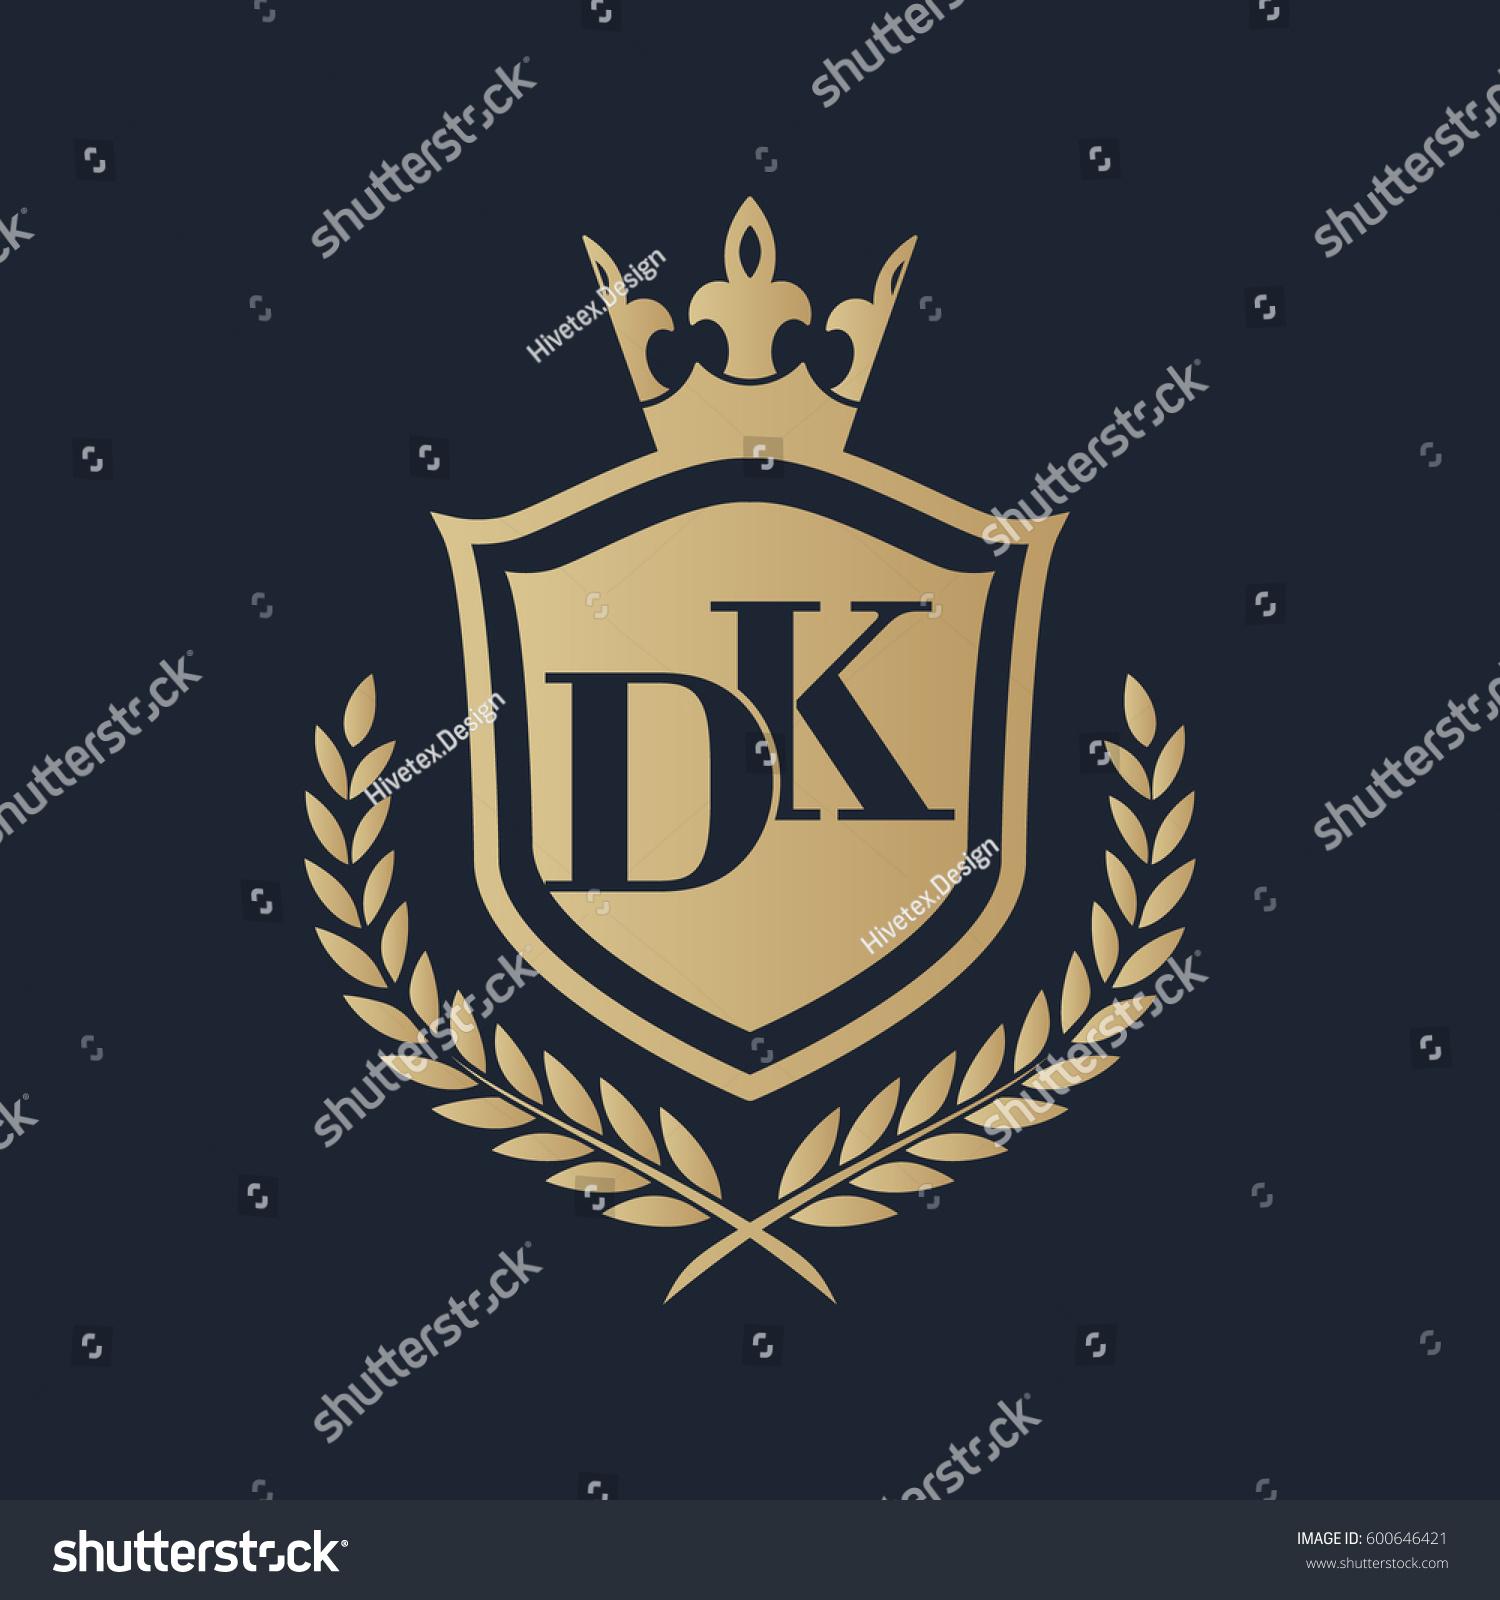 dk logo stock vector royalty free 600646421 shutterstock